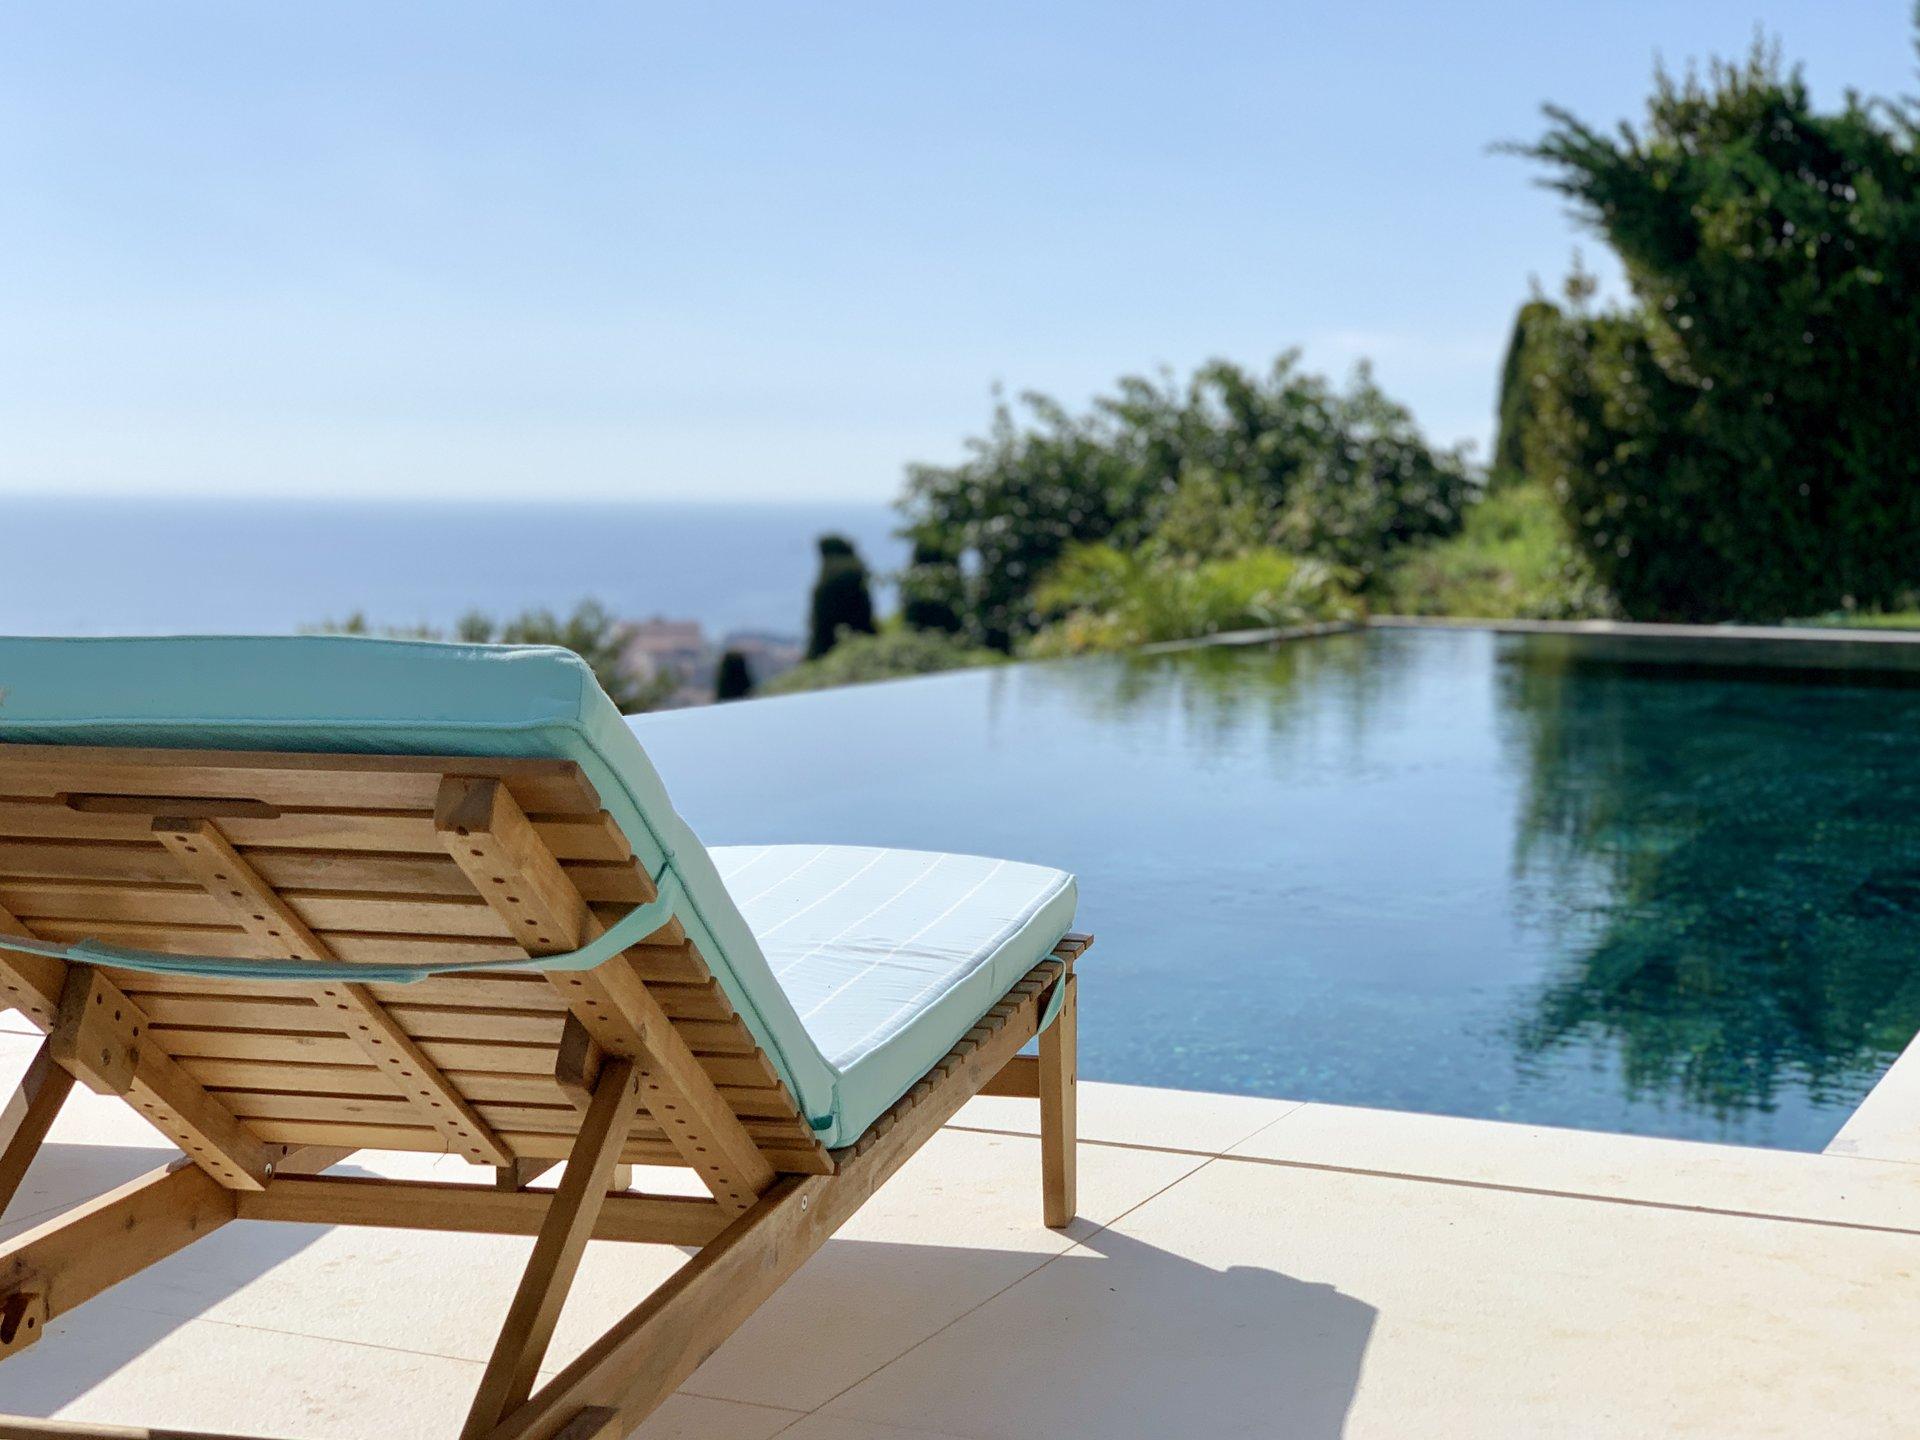 Villa contemporaine avec vue mer panoramique, piscine et parkings - Vallauris